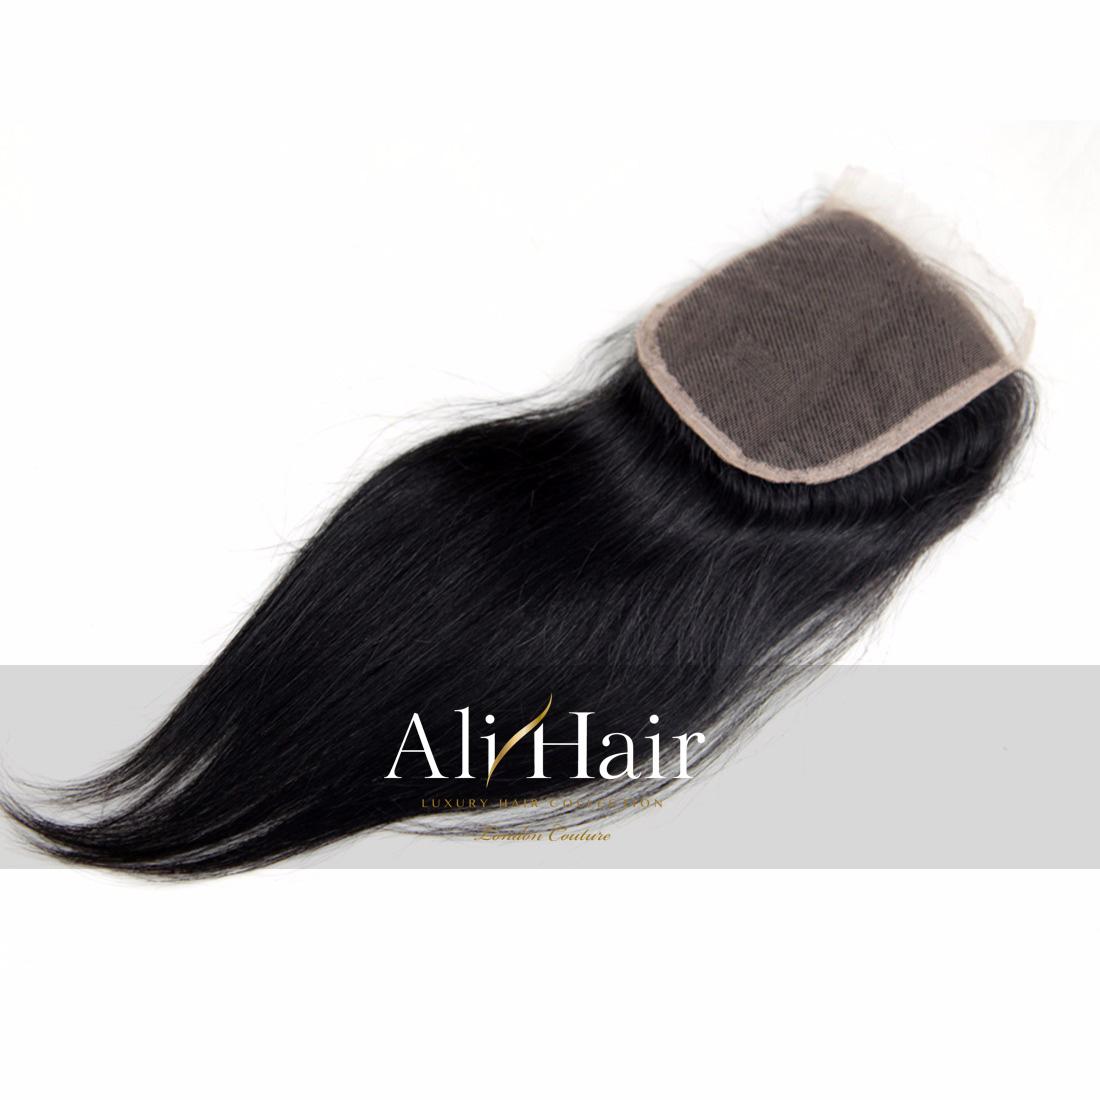 AliHair Brazilian 4x4 Straight Closure Human Gold Virgin Hair